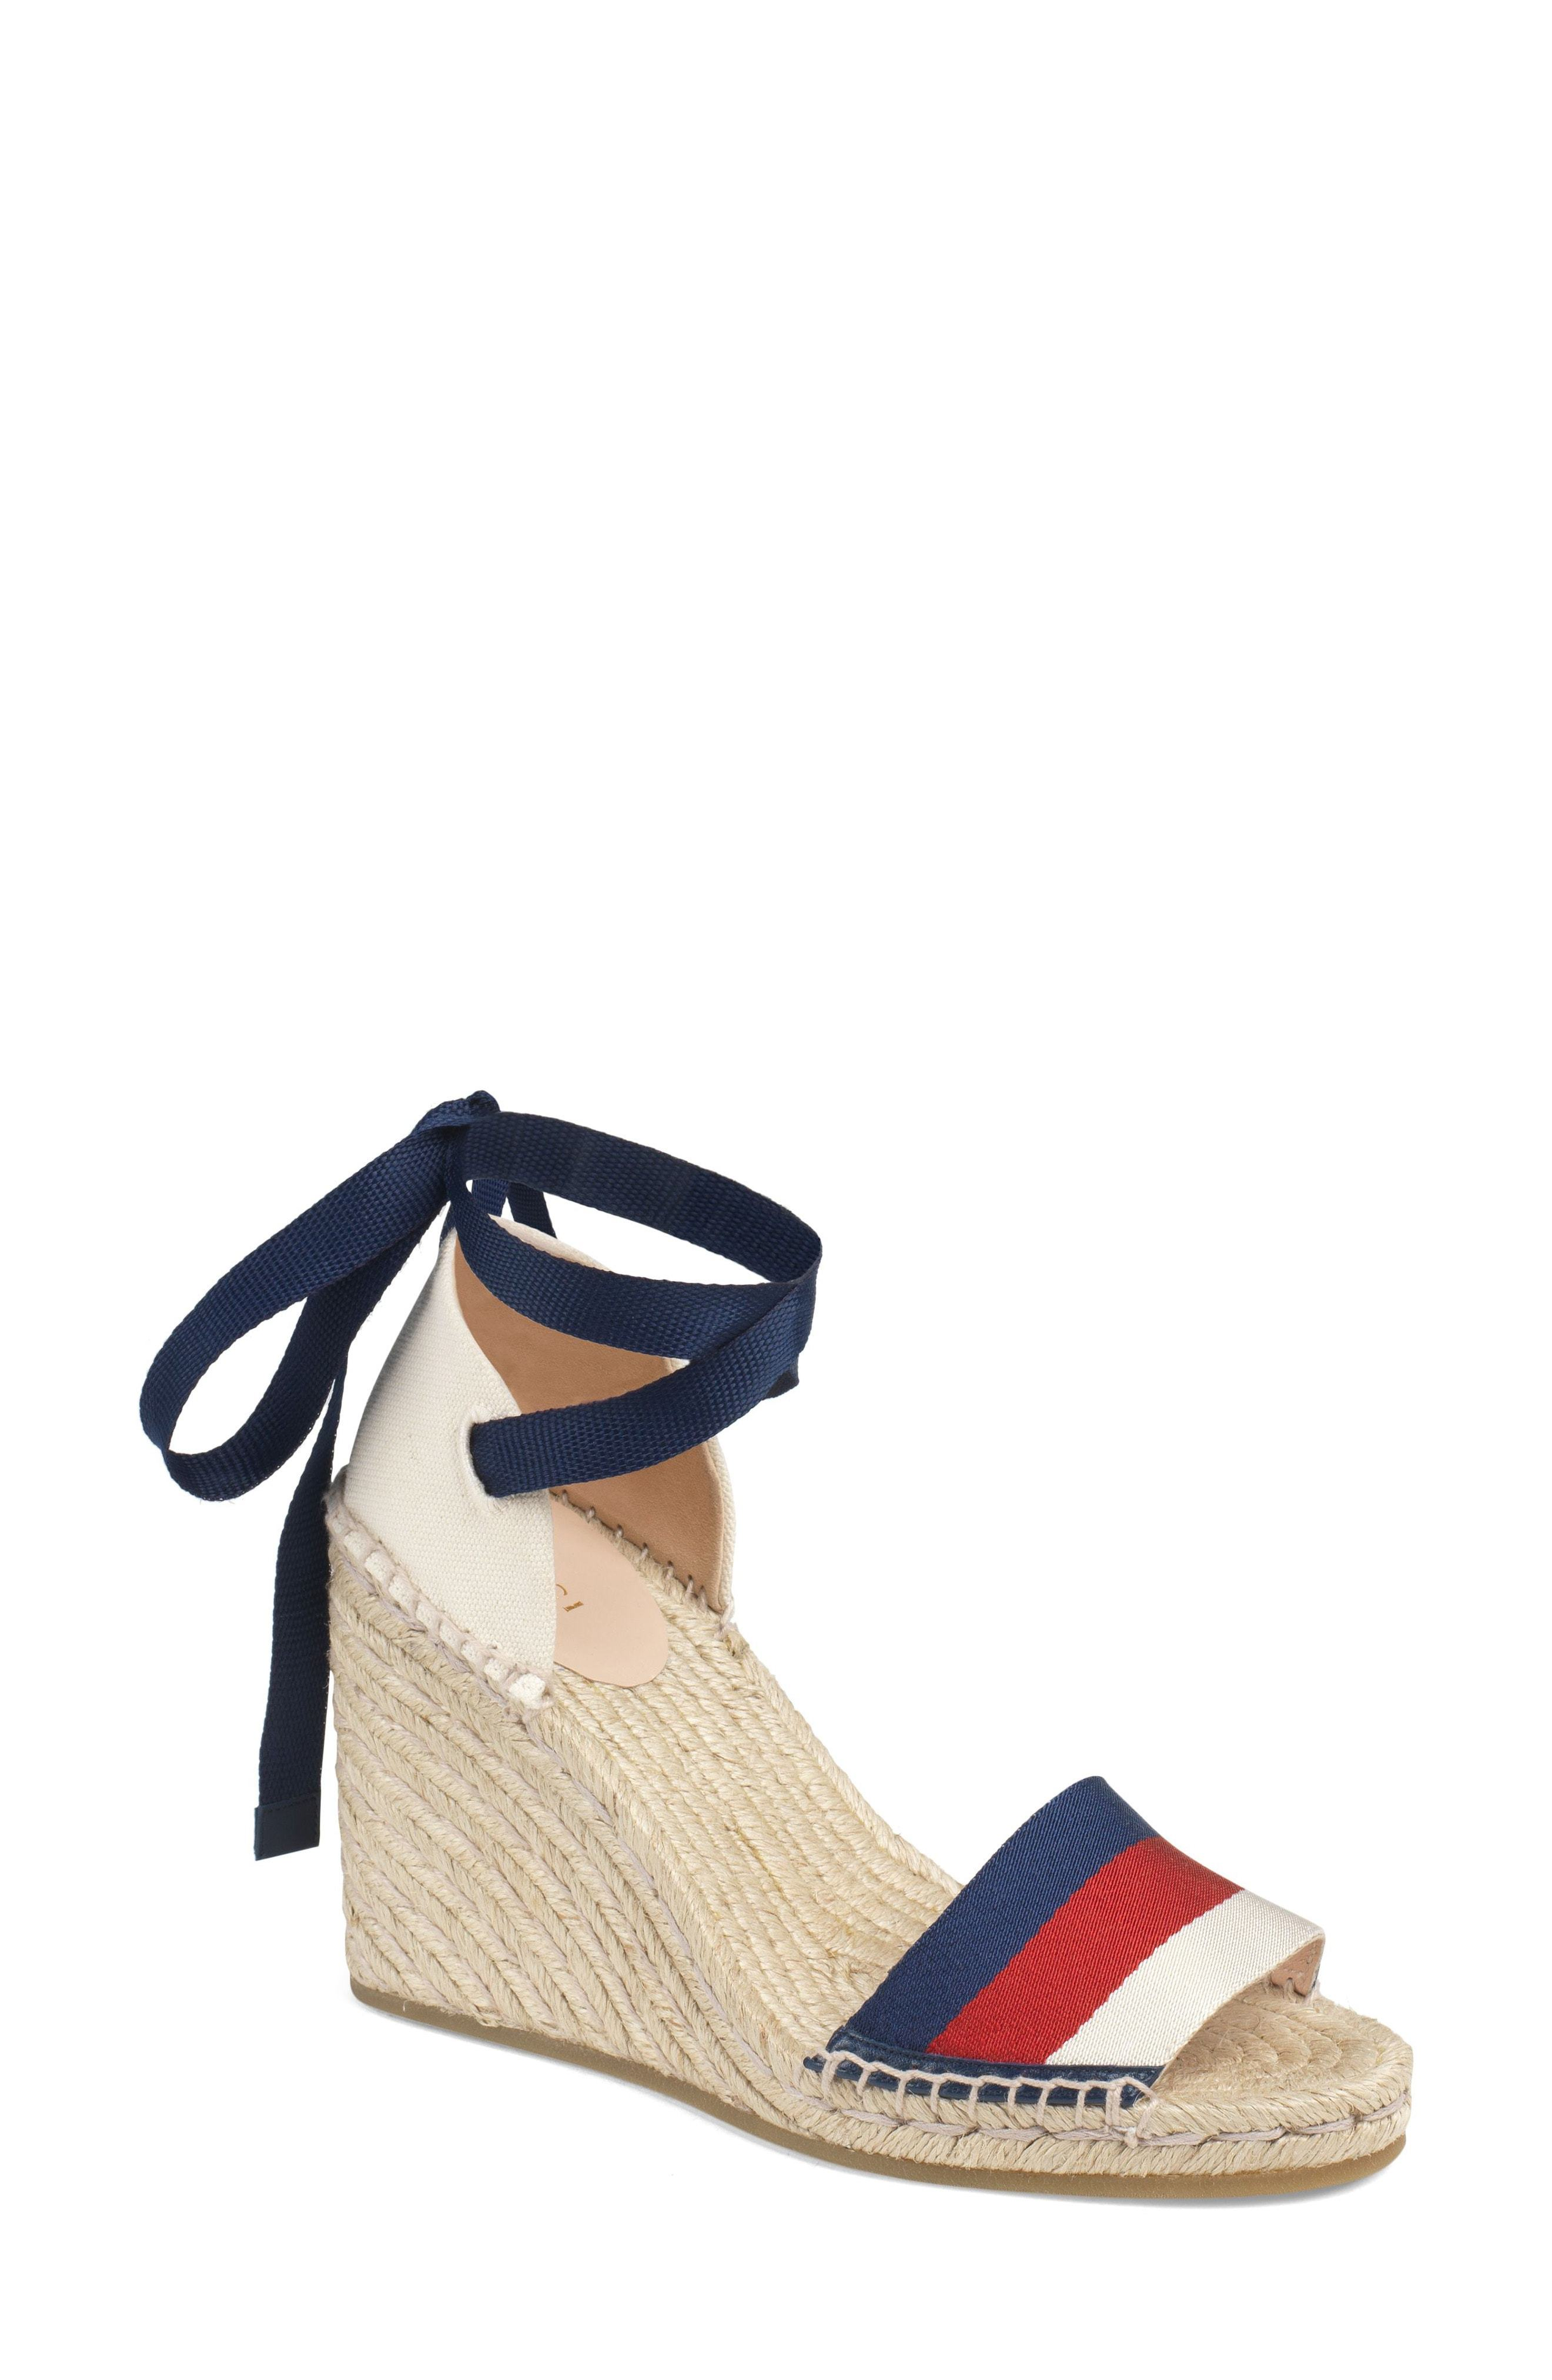 1d0841e2d921 ... White Horizontal Striped Canvas Espadrilles Gucci Lilibeth Sylvie Web  Espadrille Wedge Sandal